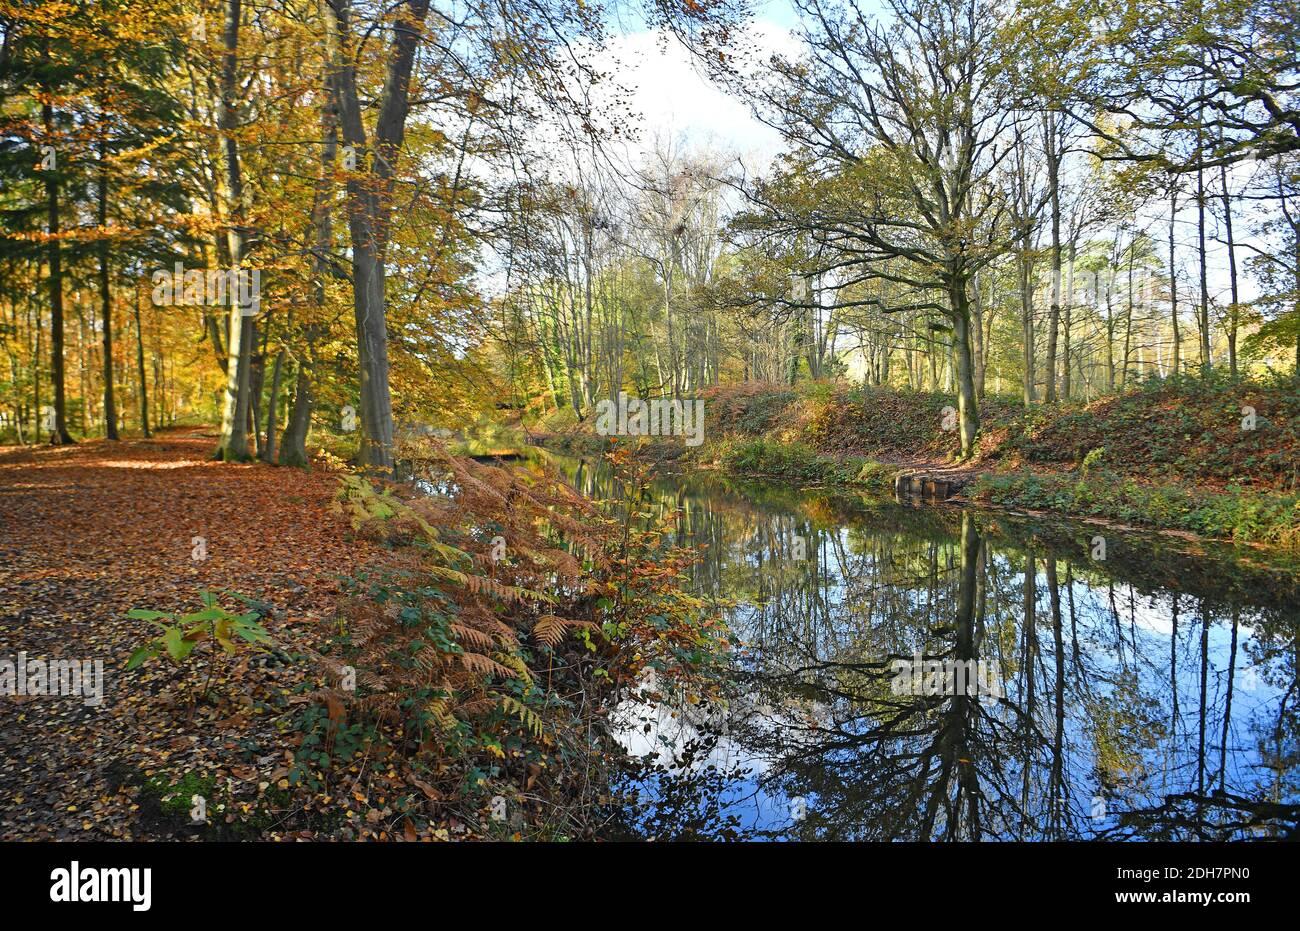 Foto per una caratteristica su Wellesley Woodland, Aldershot - Autunno weekend passeggiate. Canale di Basingstoke. Foto Stock